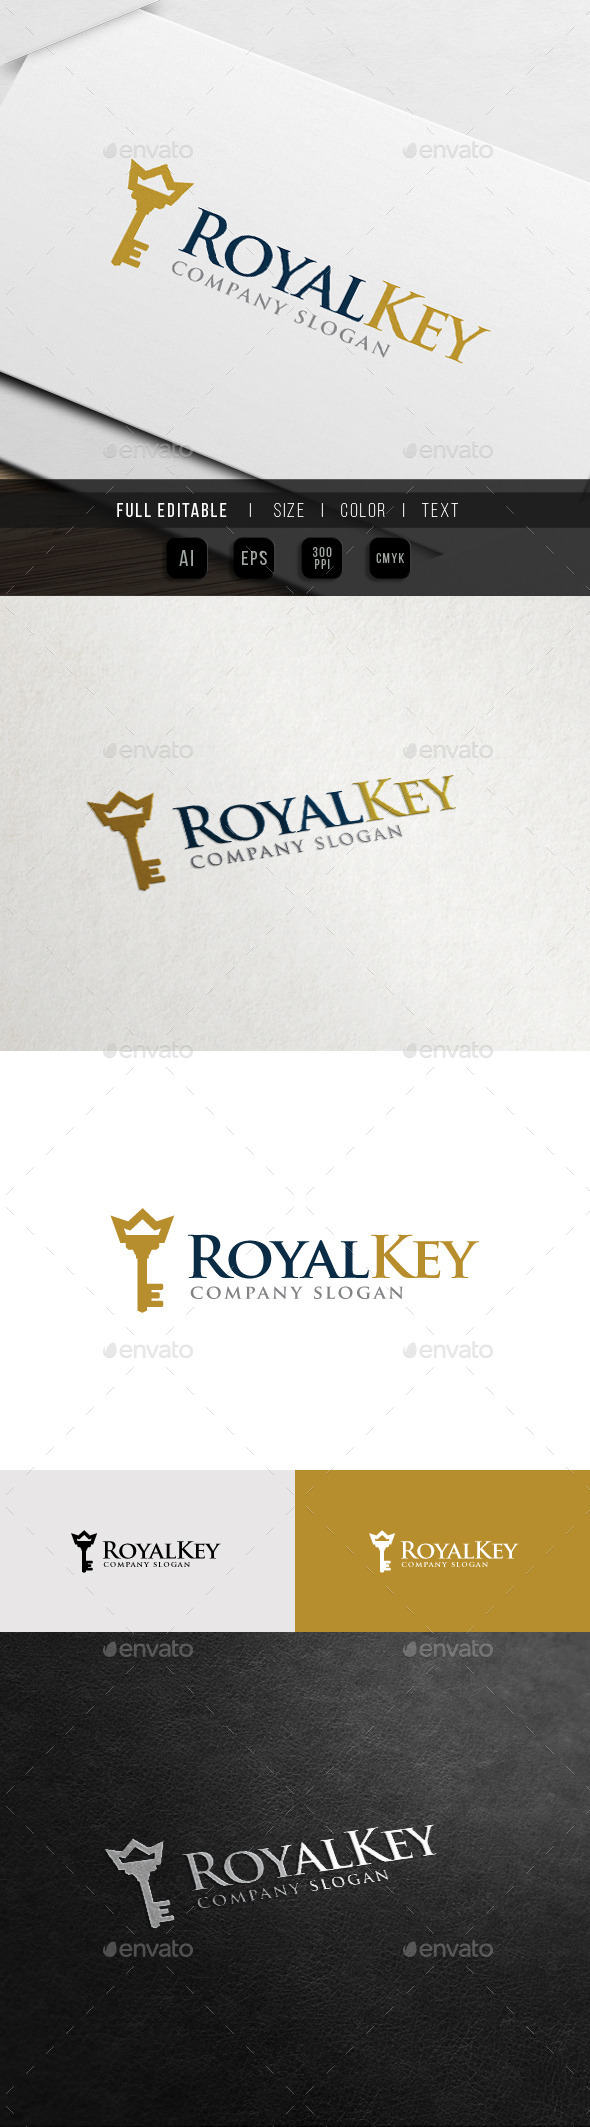 GraphicRiver Royal Key King Palace Hotel Logo 10972432